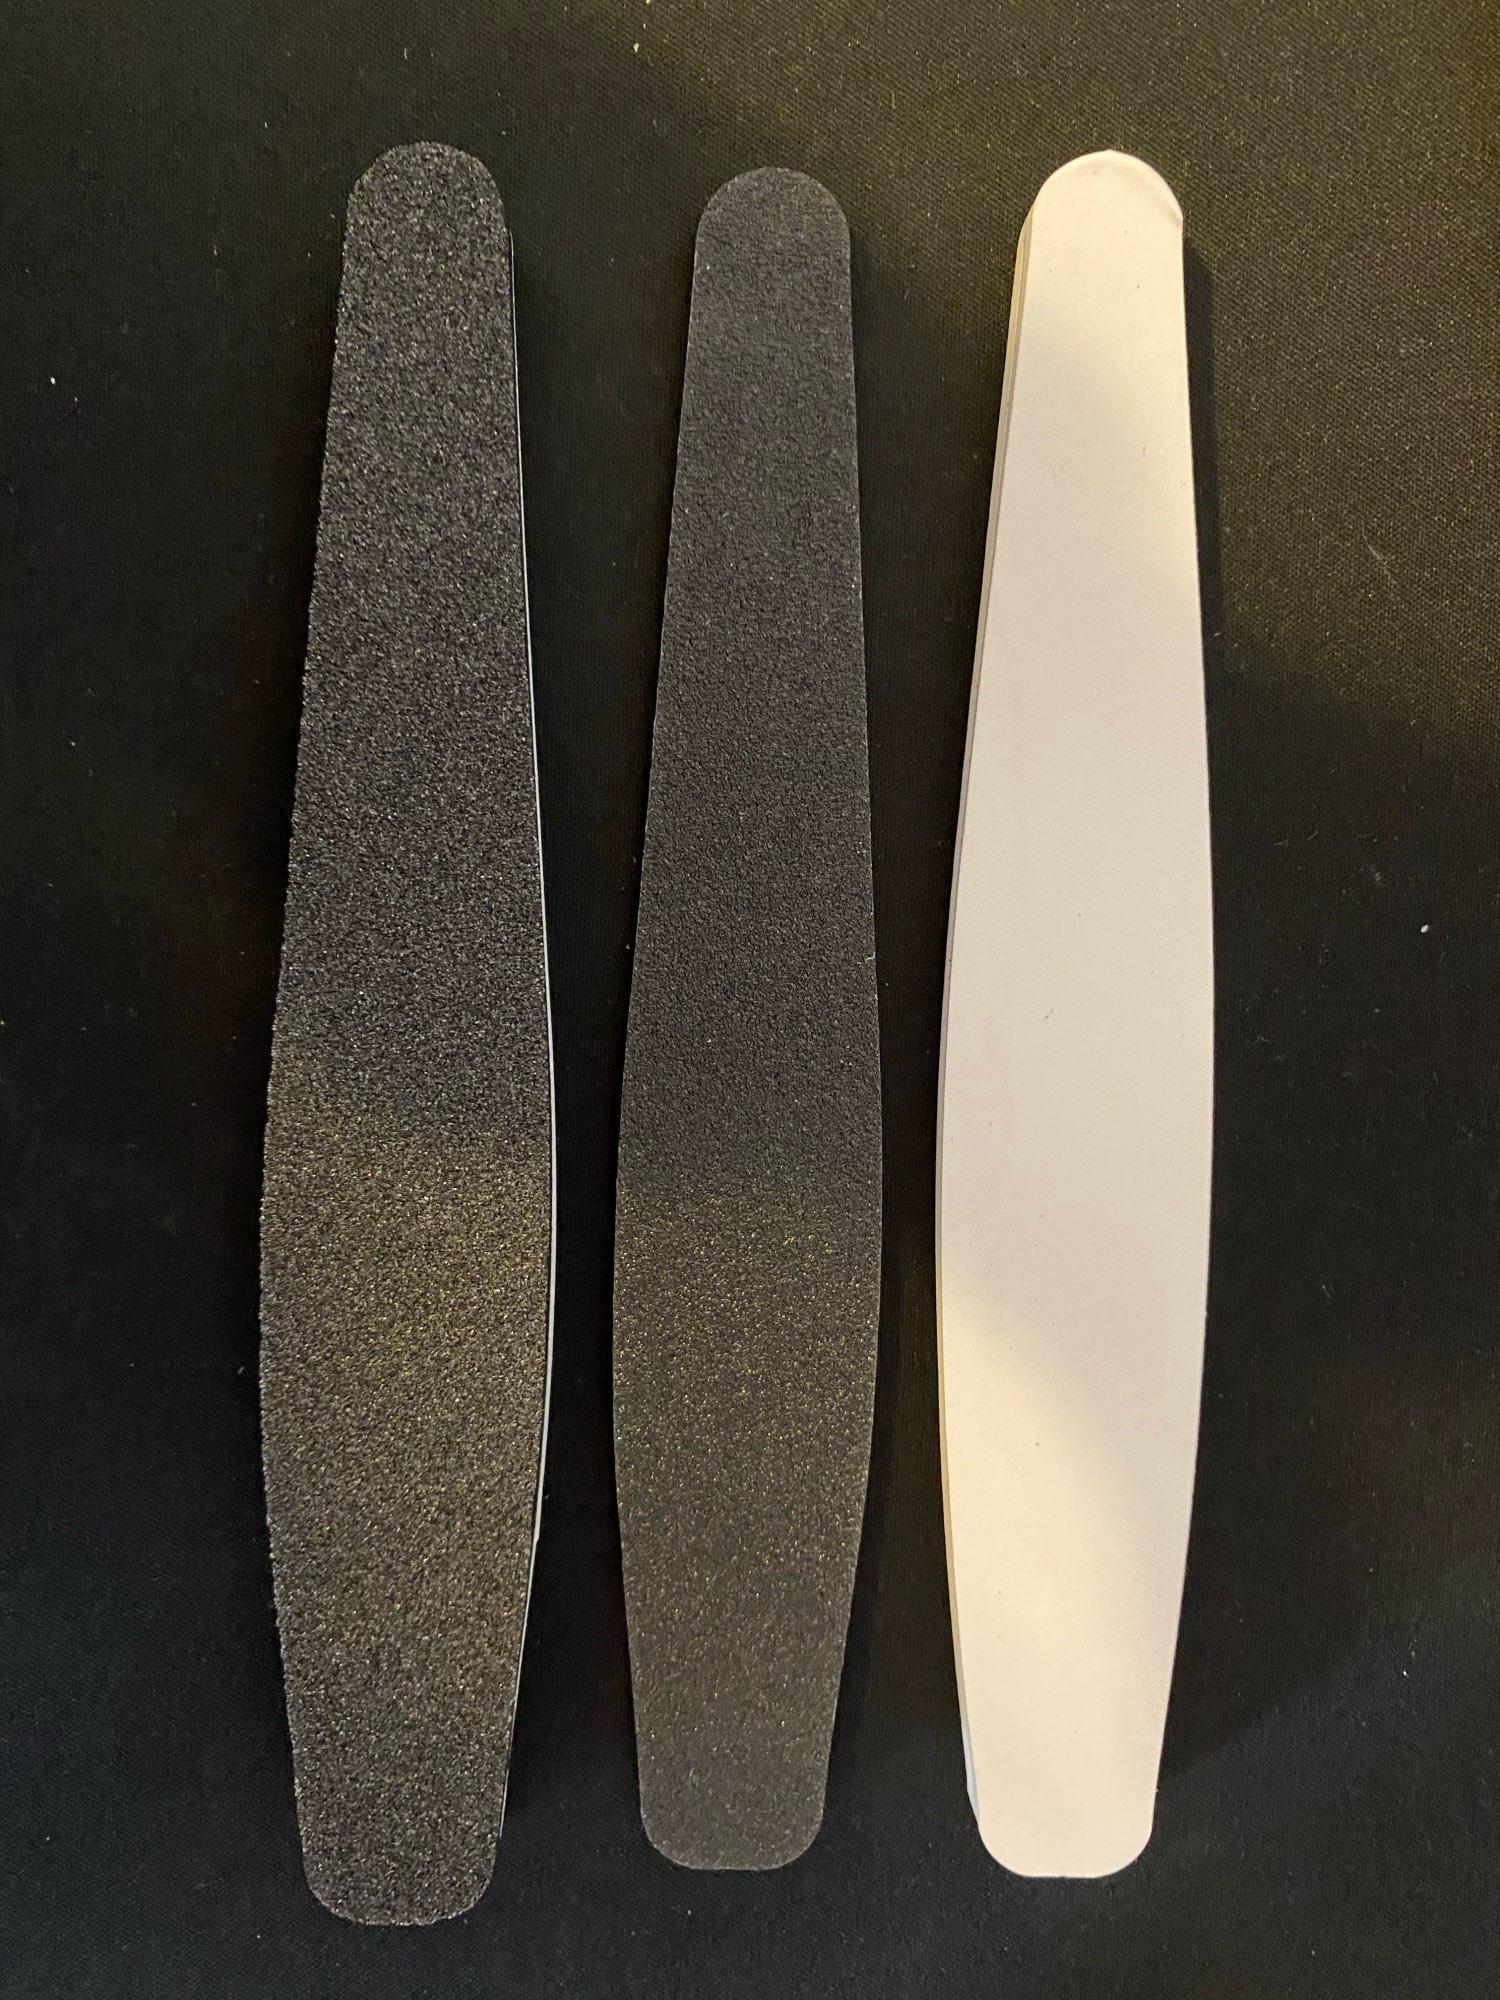 ROSALIND lima per unghie tampone